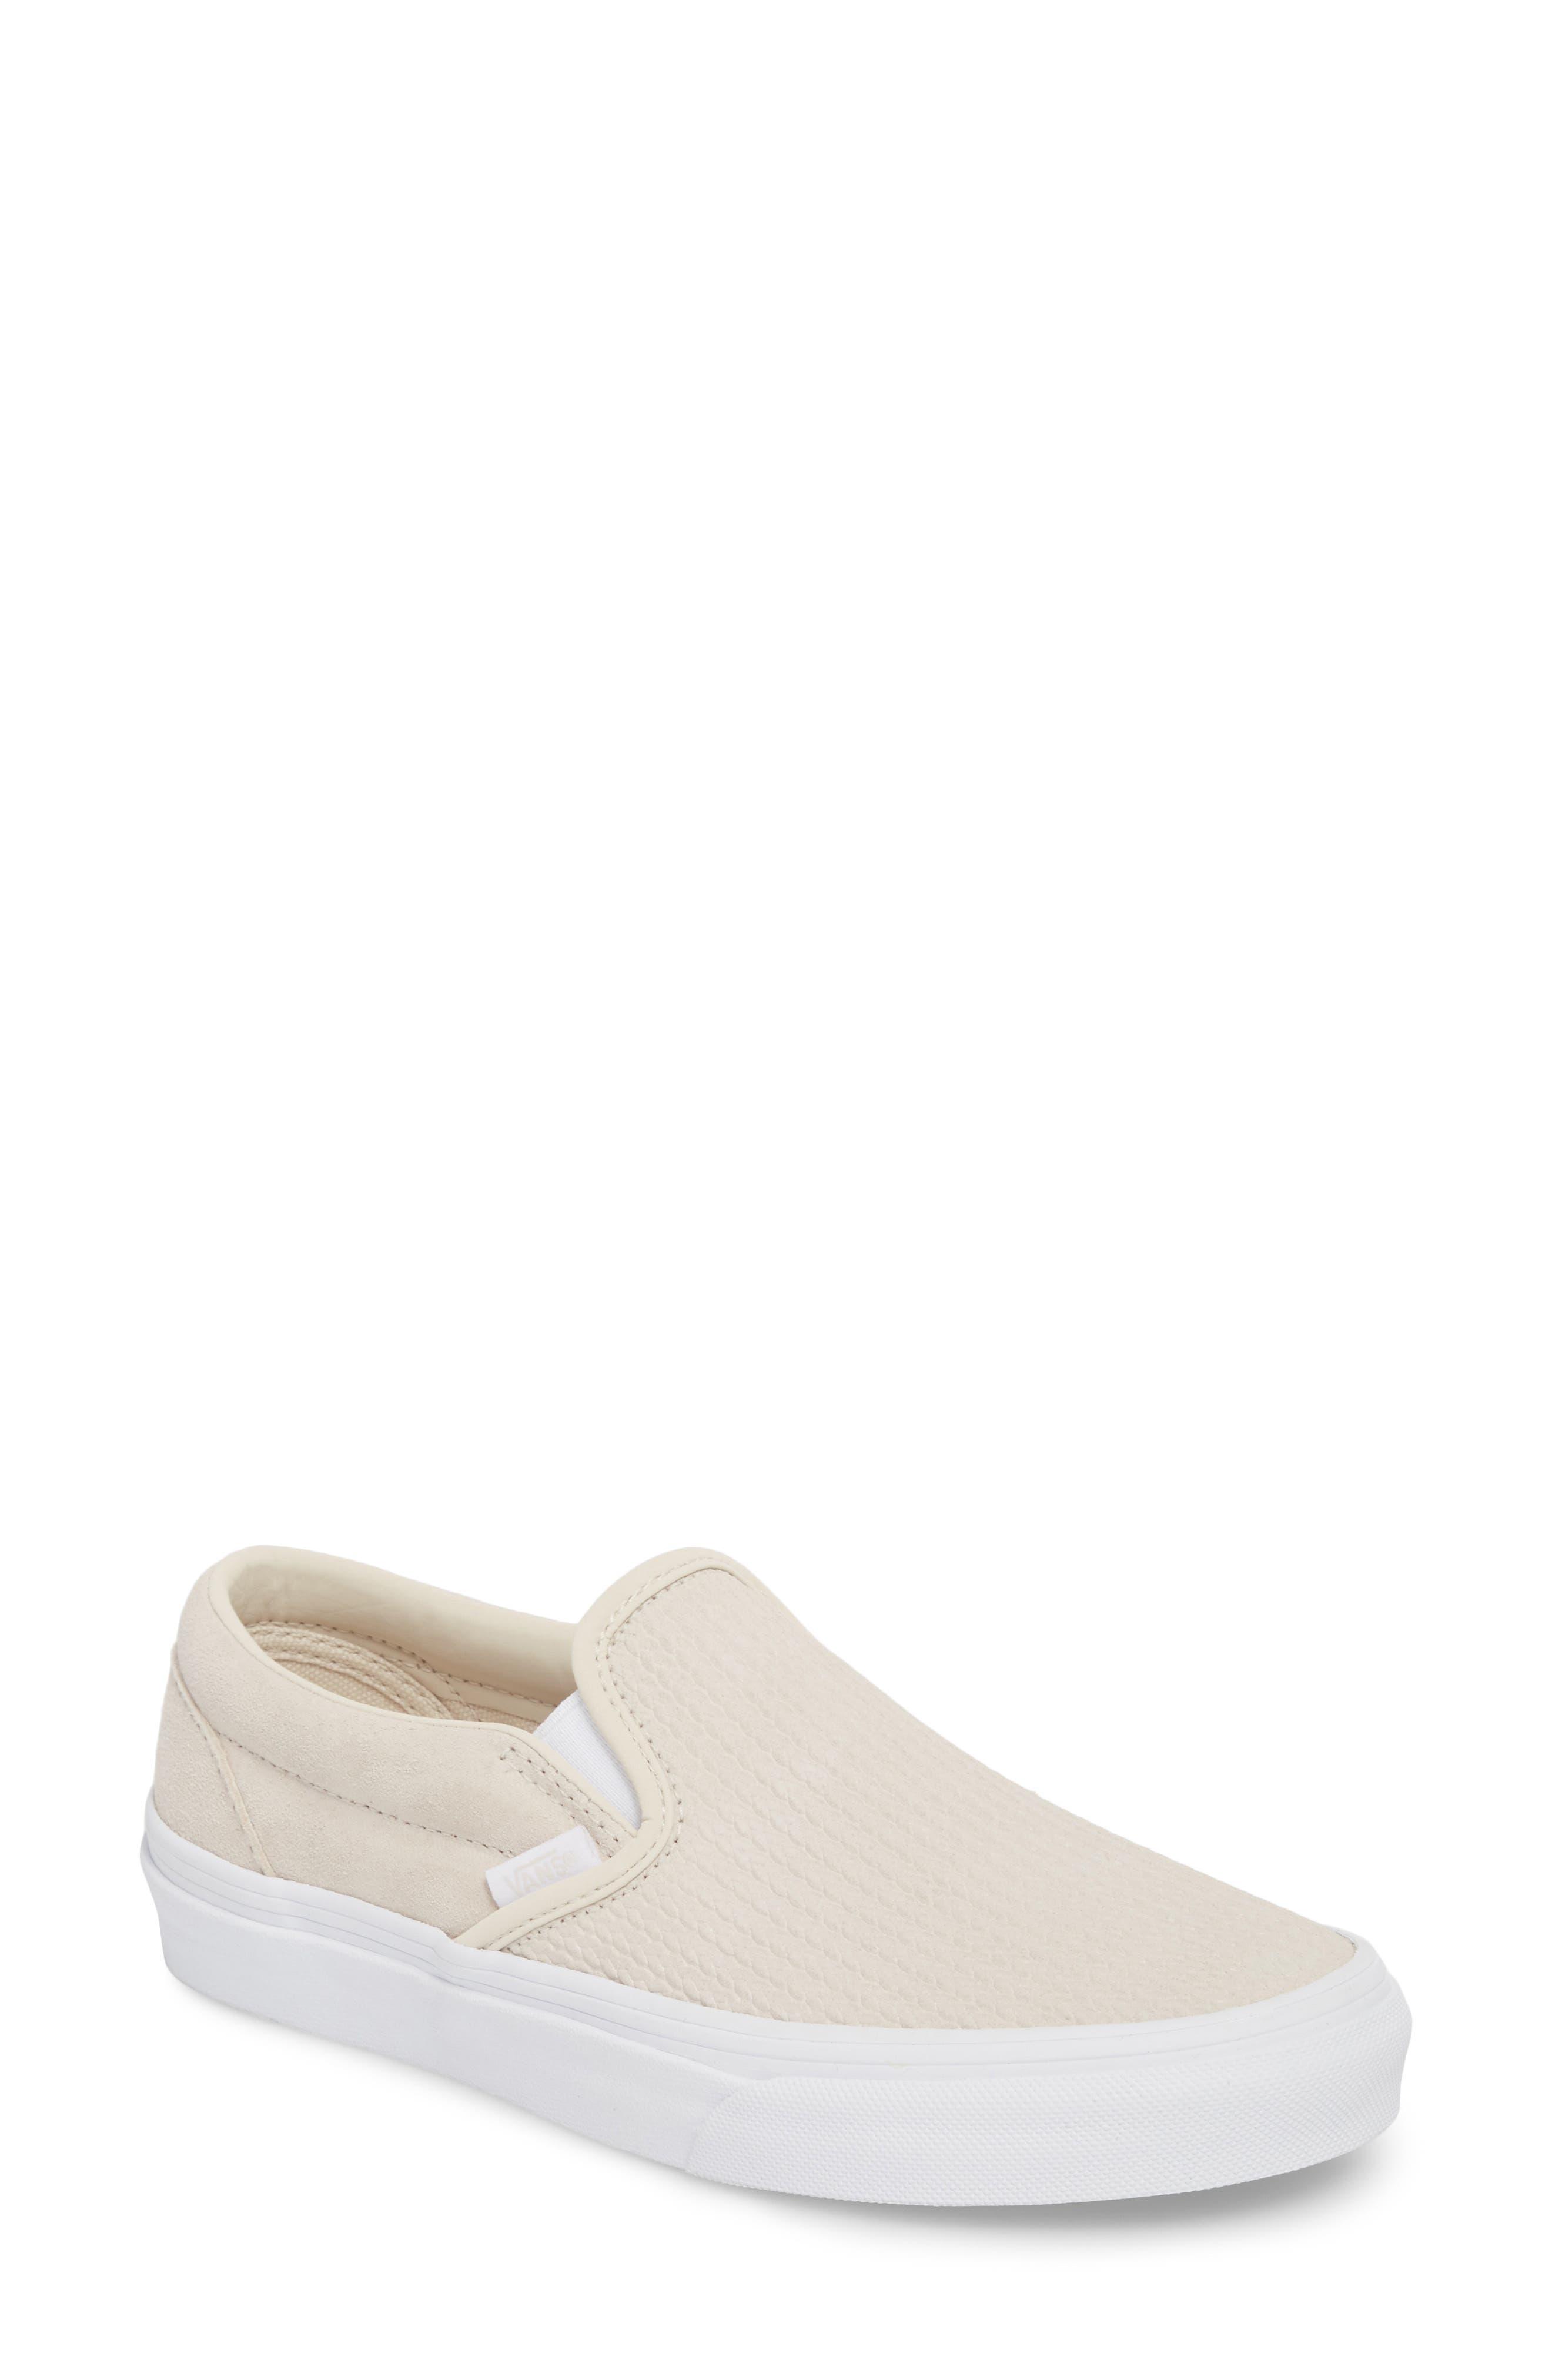 ,                             Classic Slip-On Sneaker,                             Main thumbnail 135, color,                             271